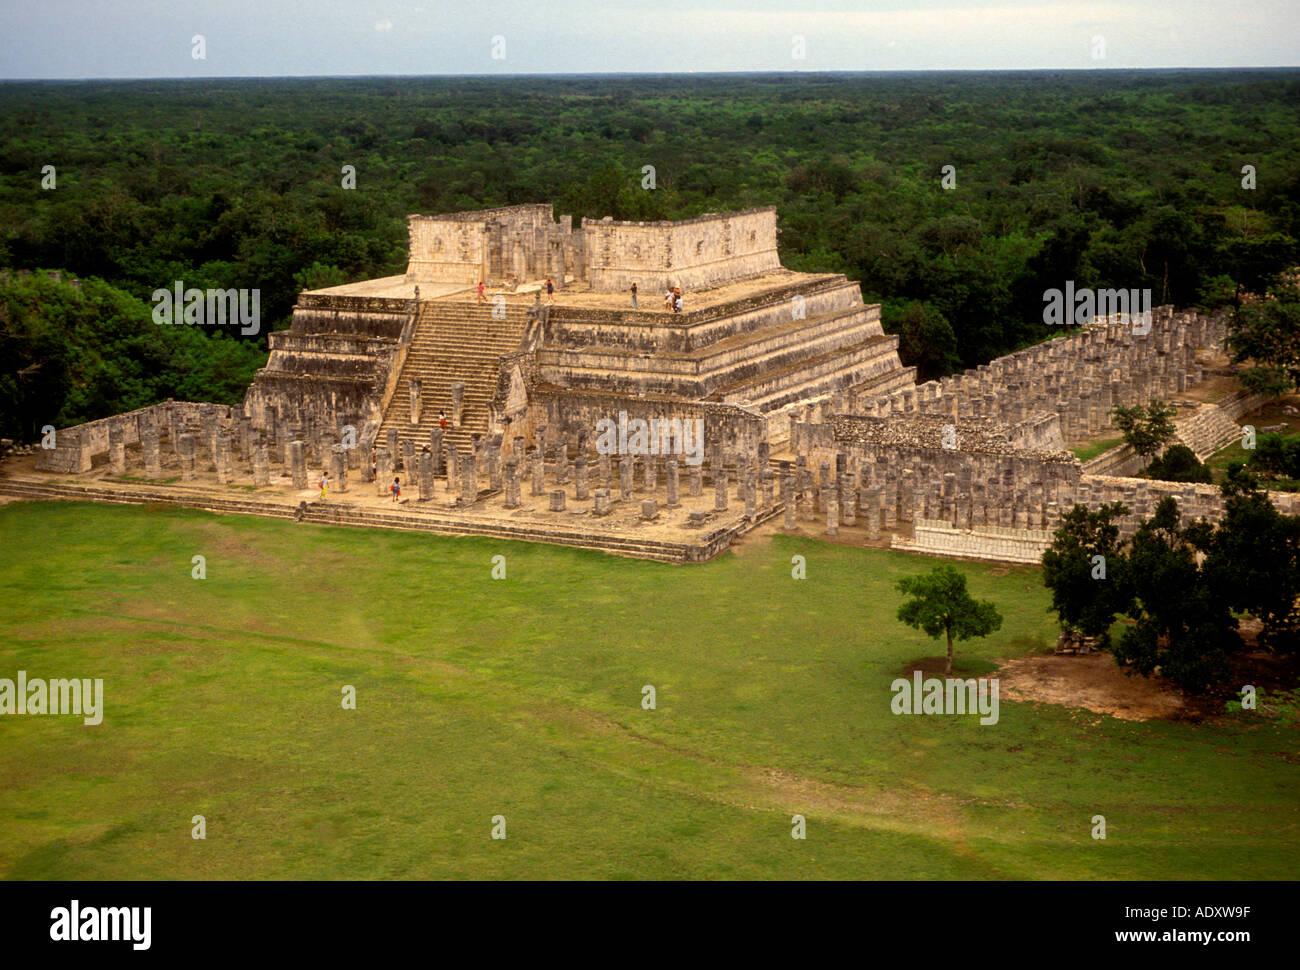 Temple of the Warriors, Templo de los Guerreros, Chichen Itza Archaeological Site, Yucatan State, Yucatan Peninsula, - Stock Image